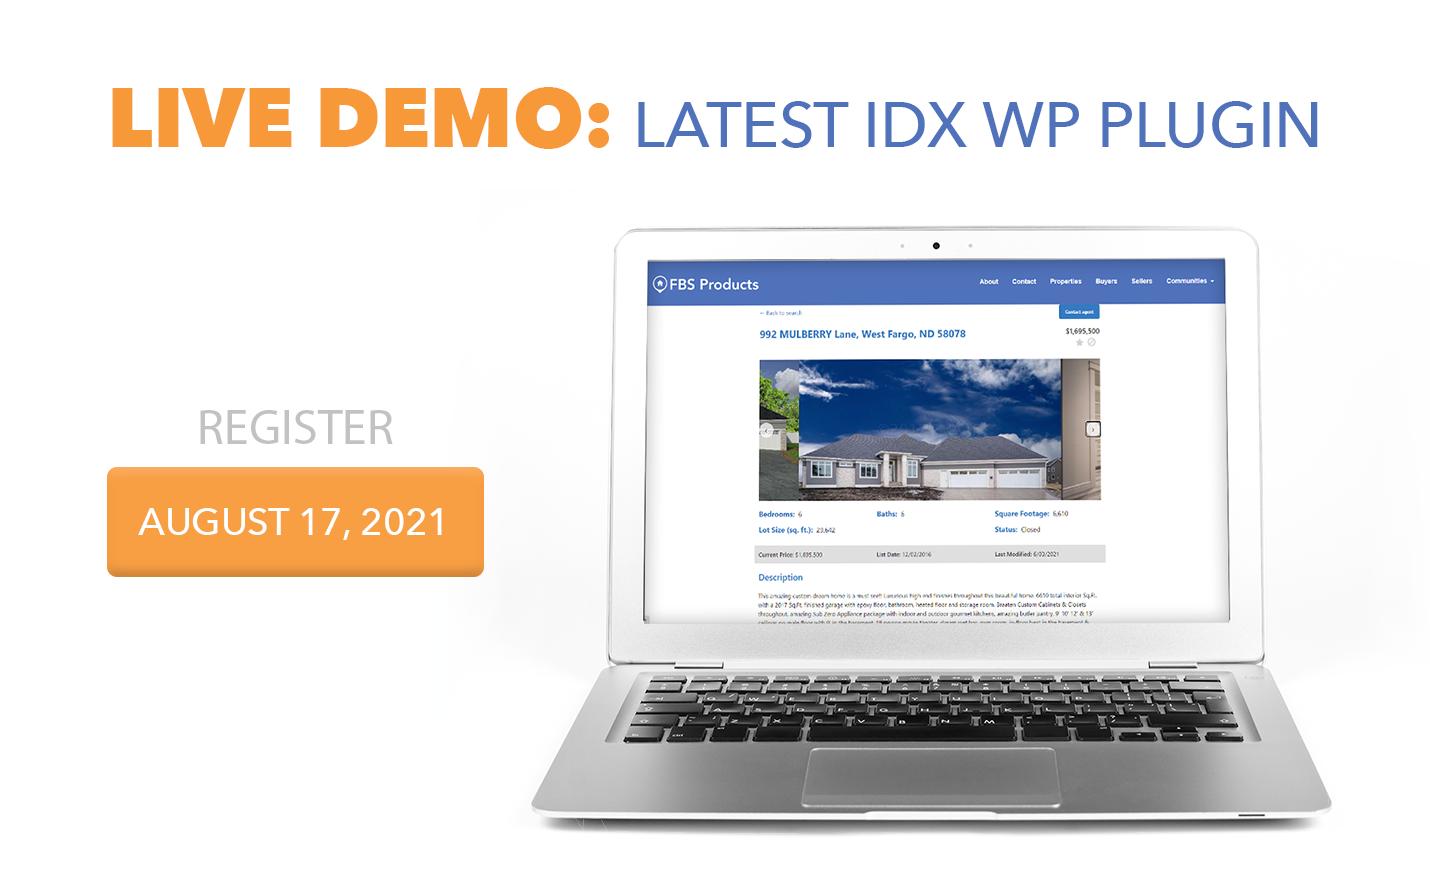 Flexmls IDX WordPress Plugin version 3.12 Live Demo Webinar August 17 2021